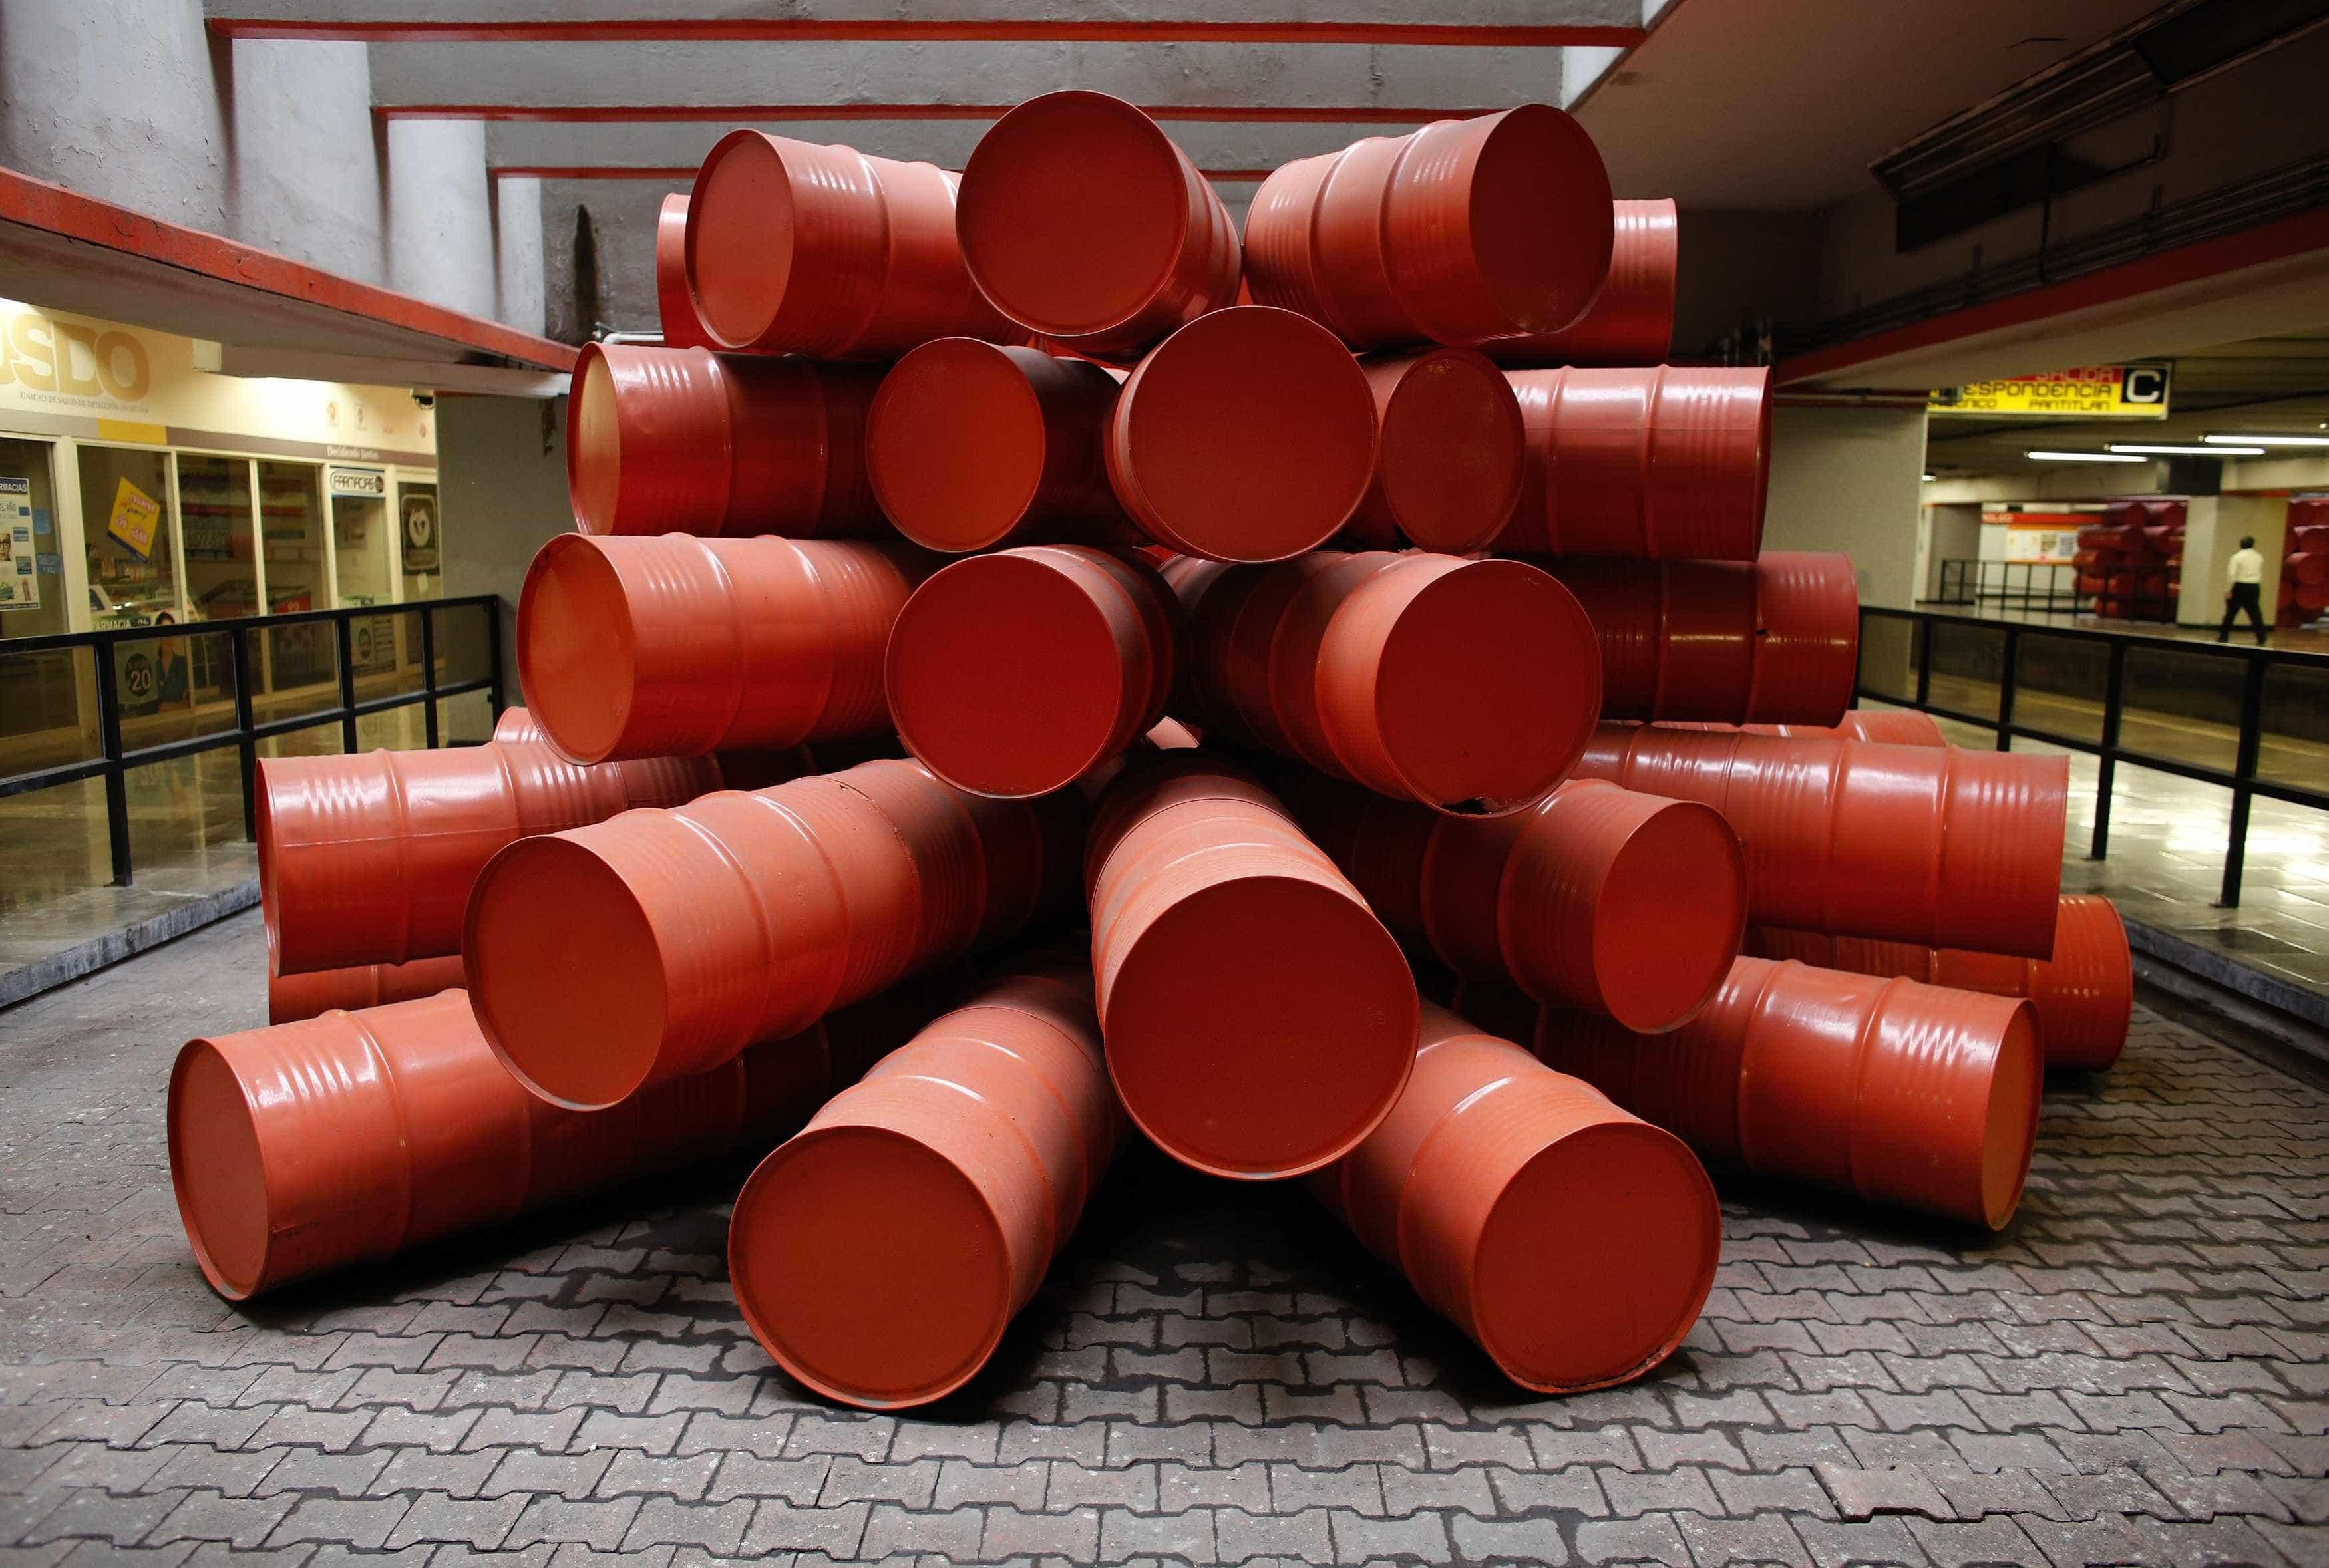 Barril de petróleo Brent cai para mínimo desde novembro de 2017